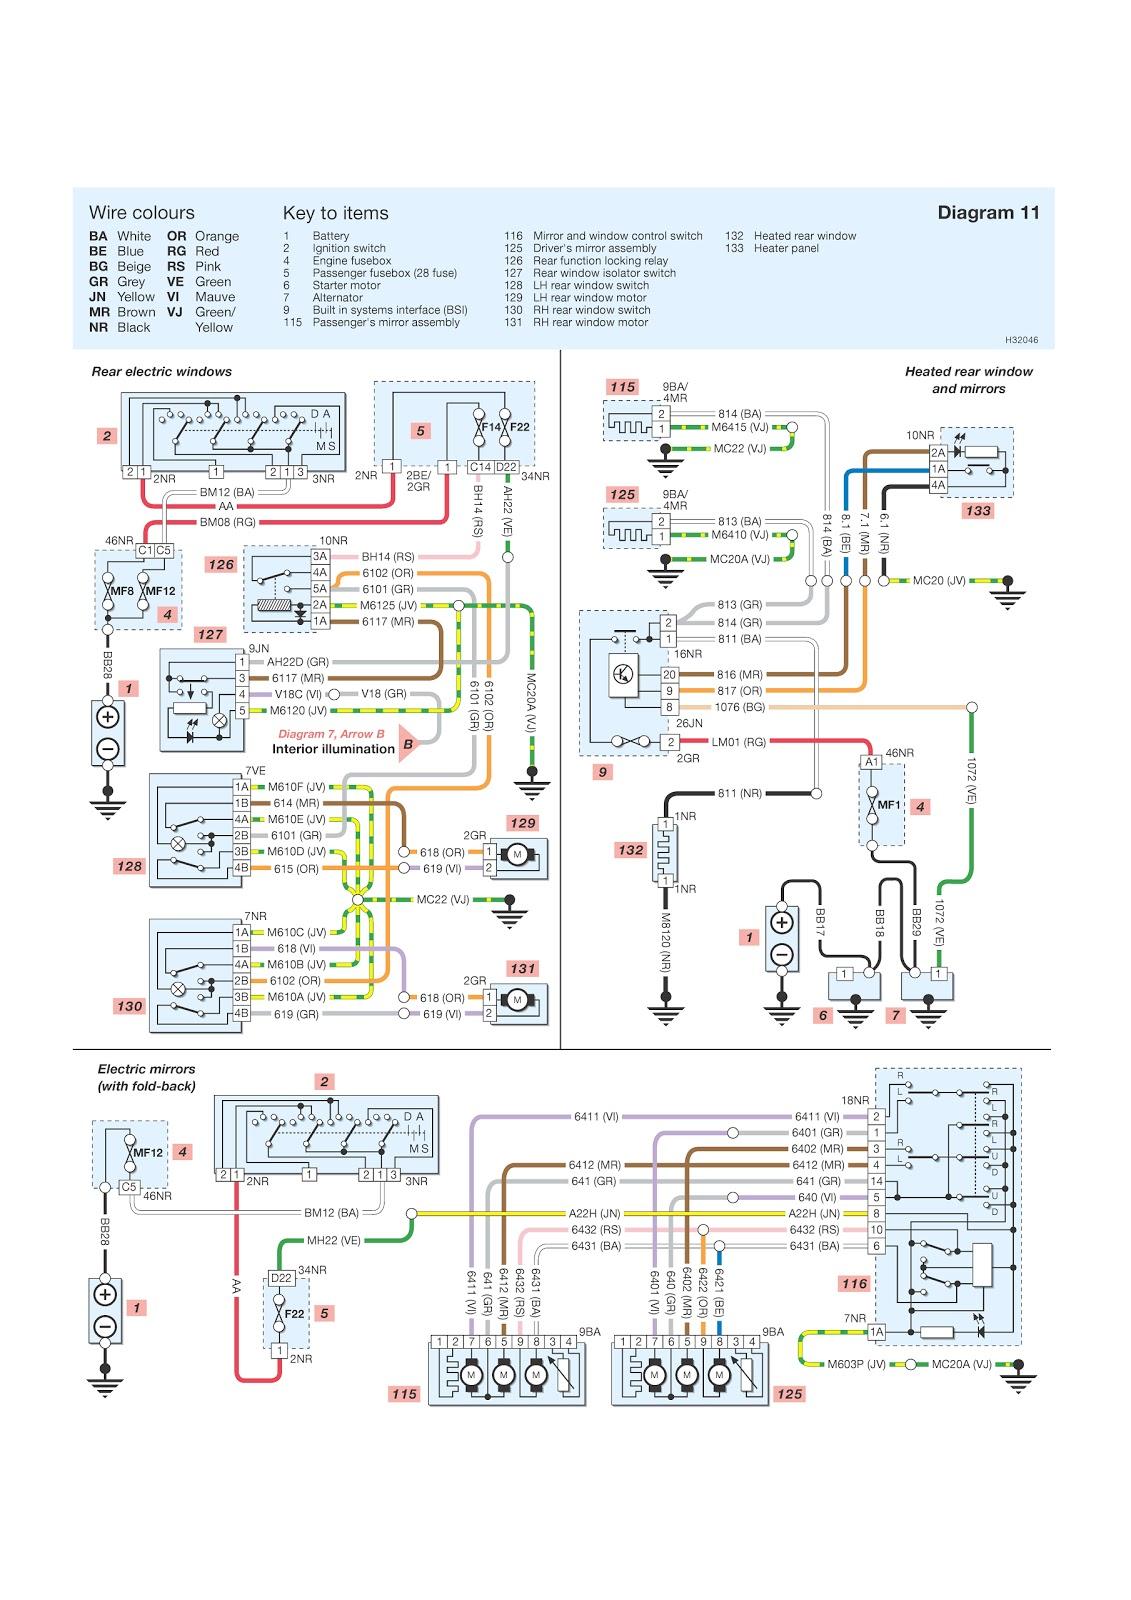 peugeot 508 wiring diagram peugeot family wiring diagram